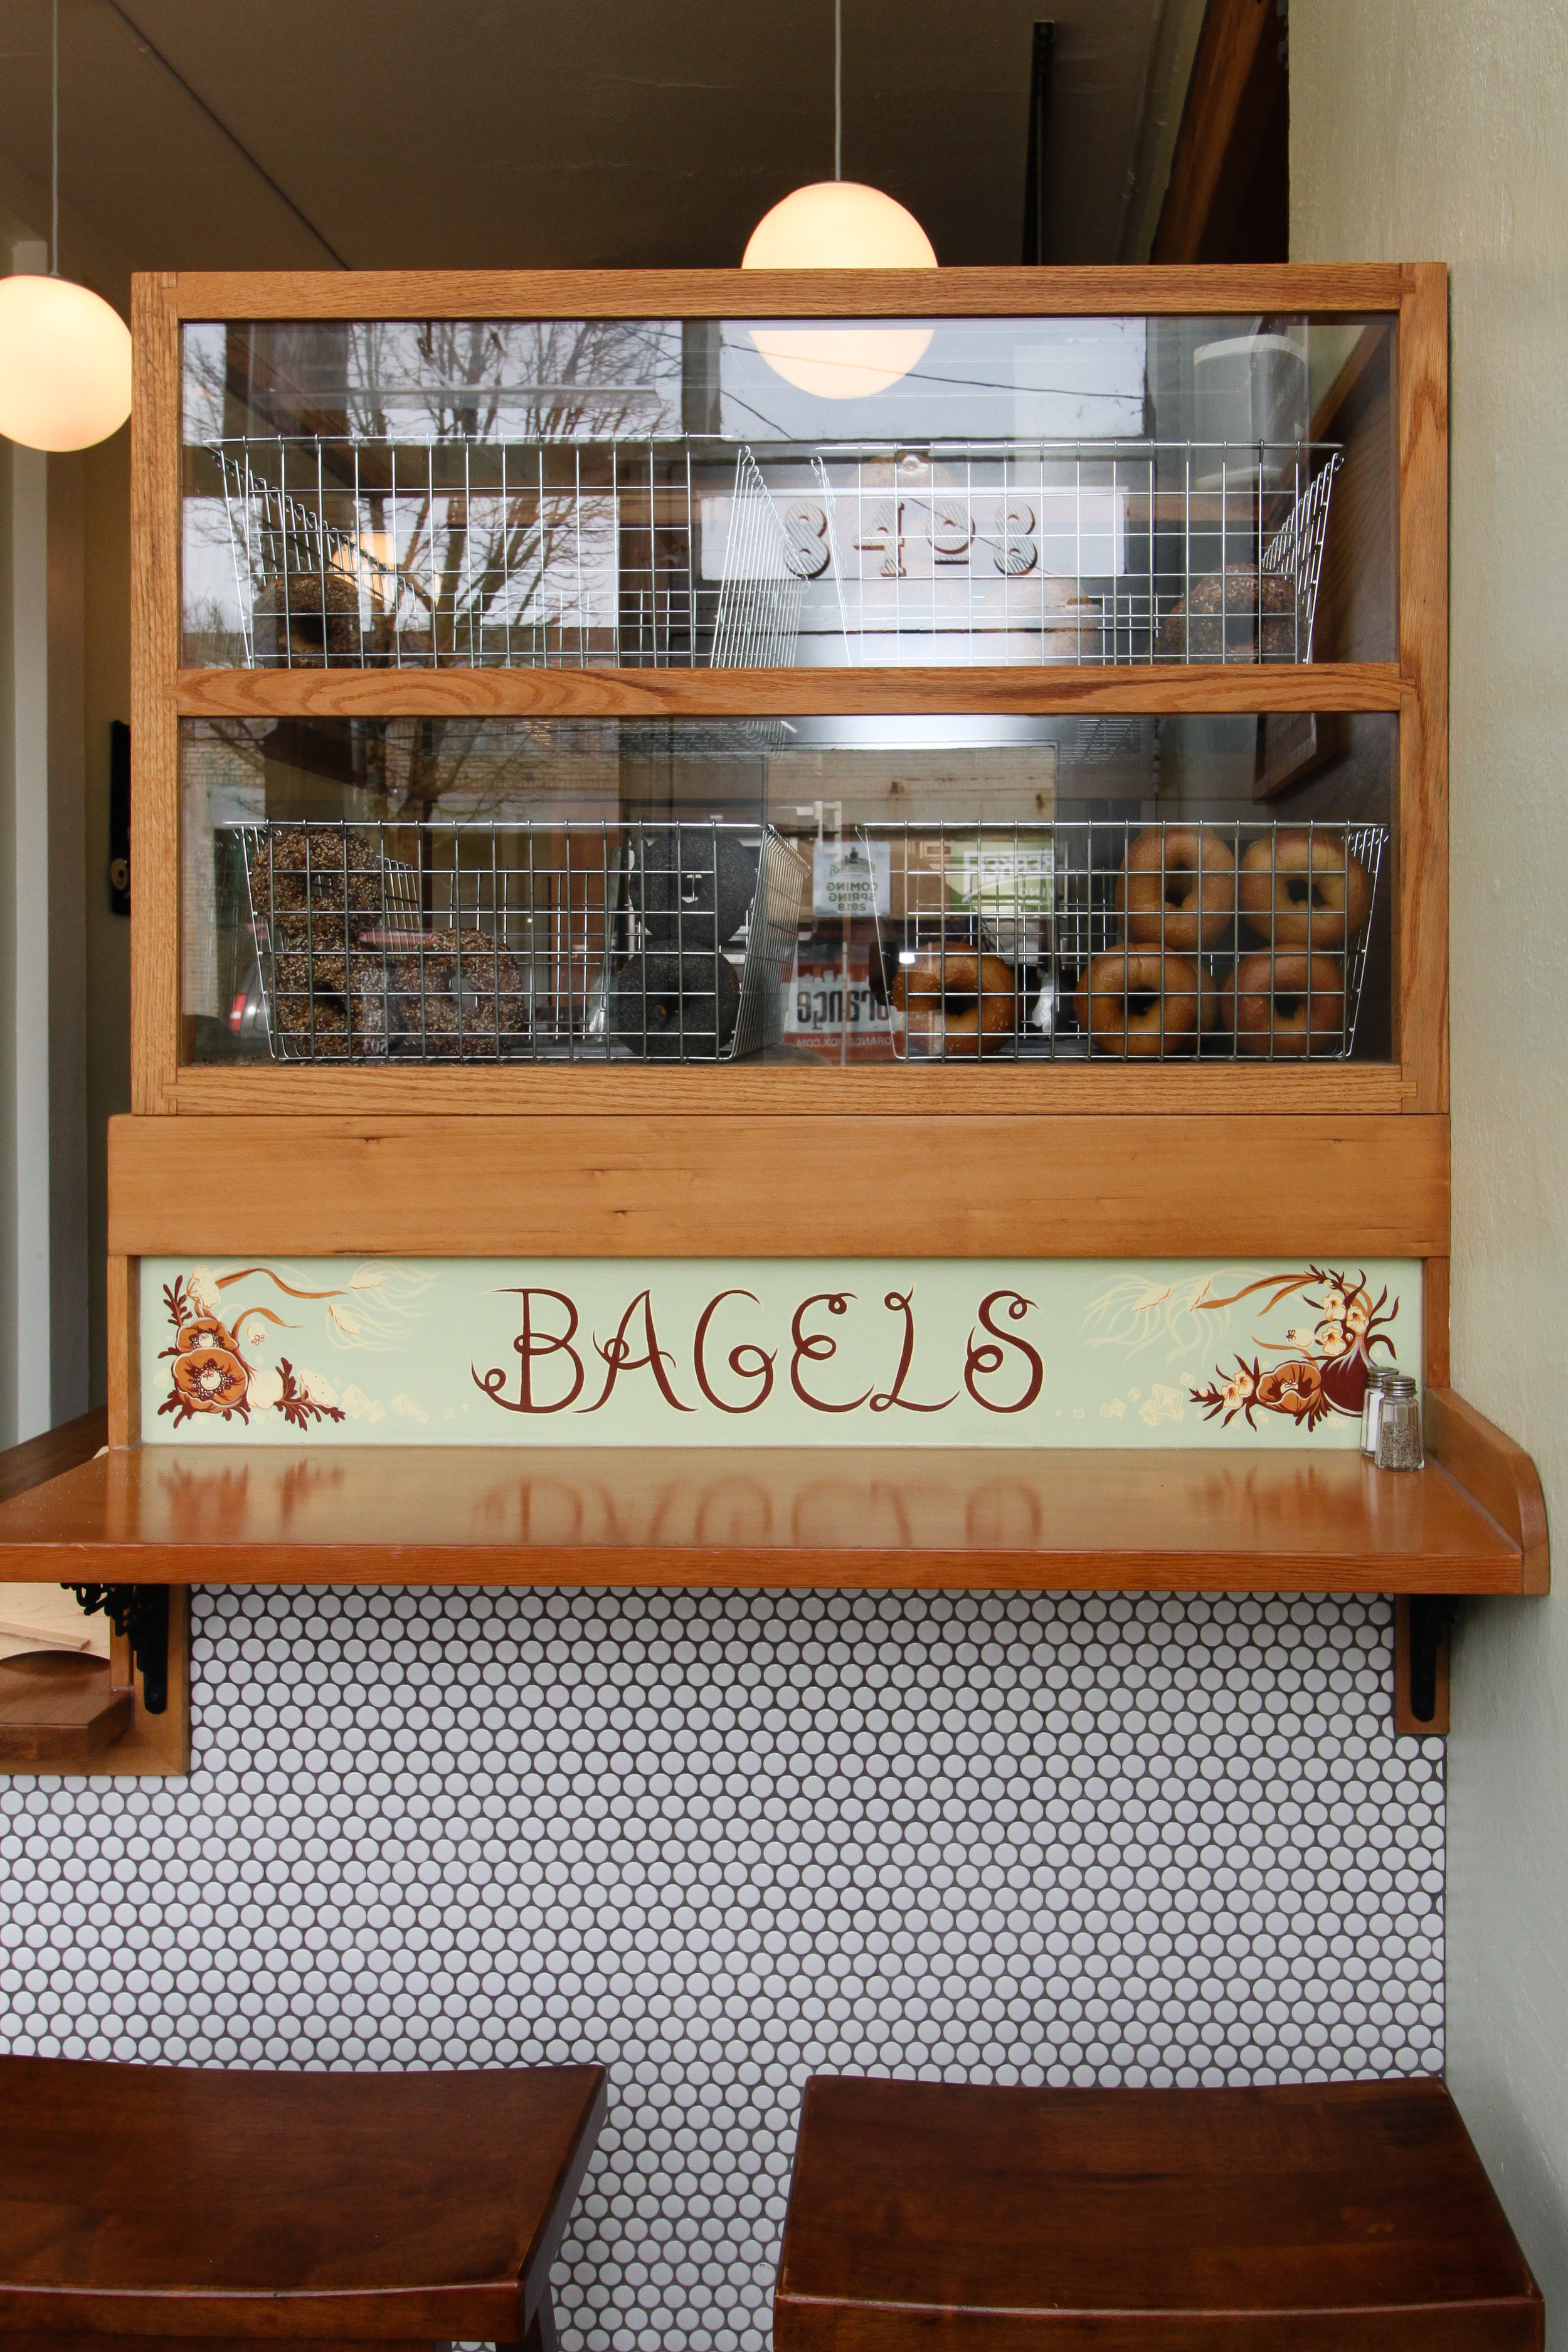 BagelShop (1 of 17).jpg